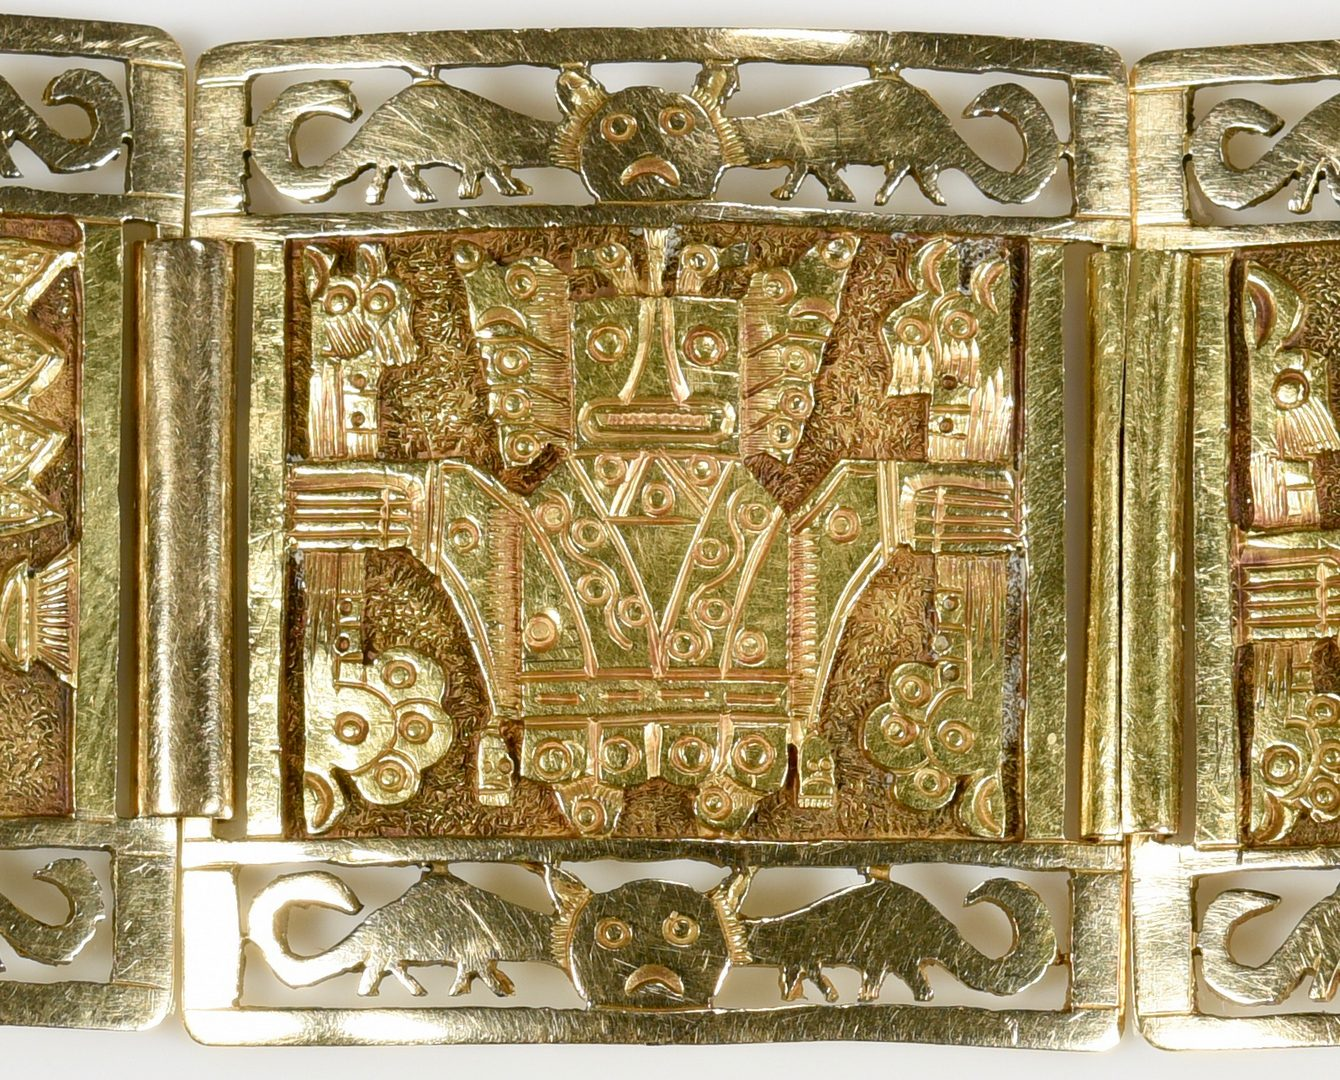 Lot 423: 18K Peruvian Link Bracelet, 88.7 grams